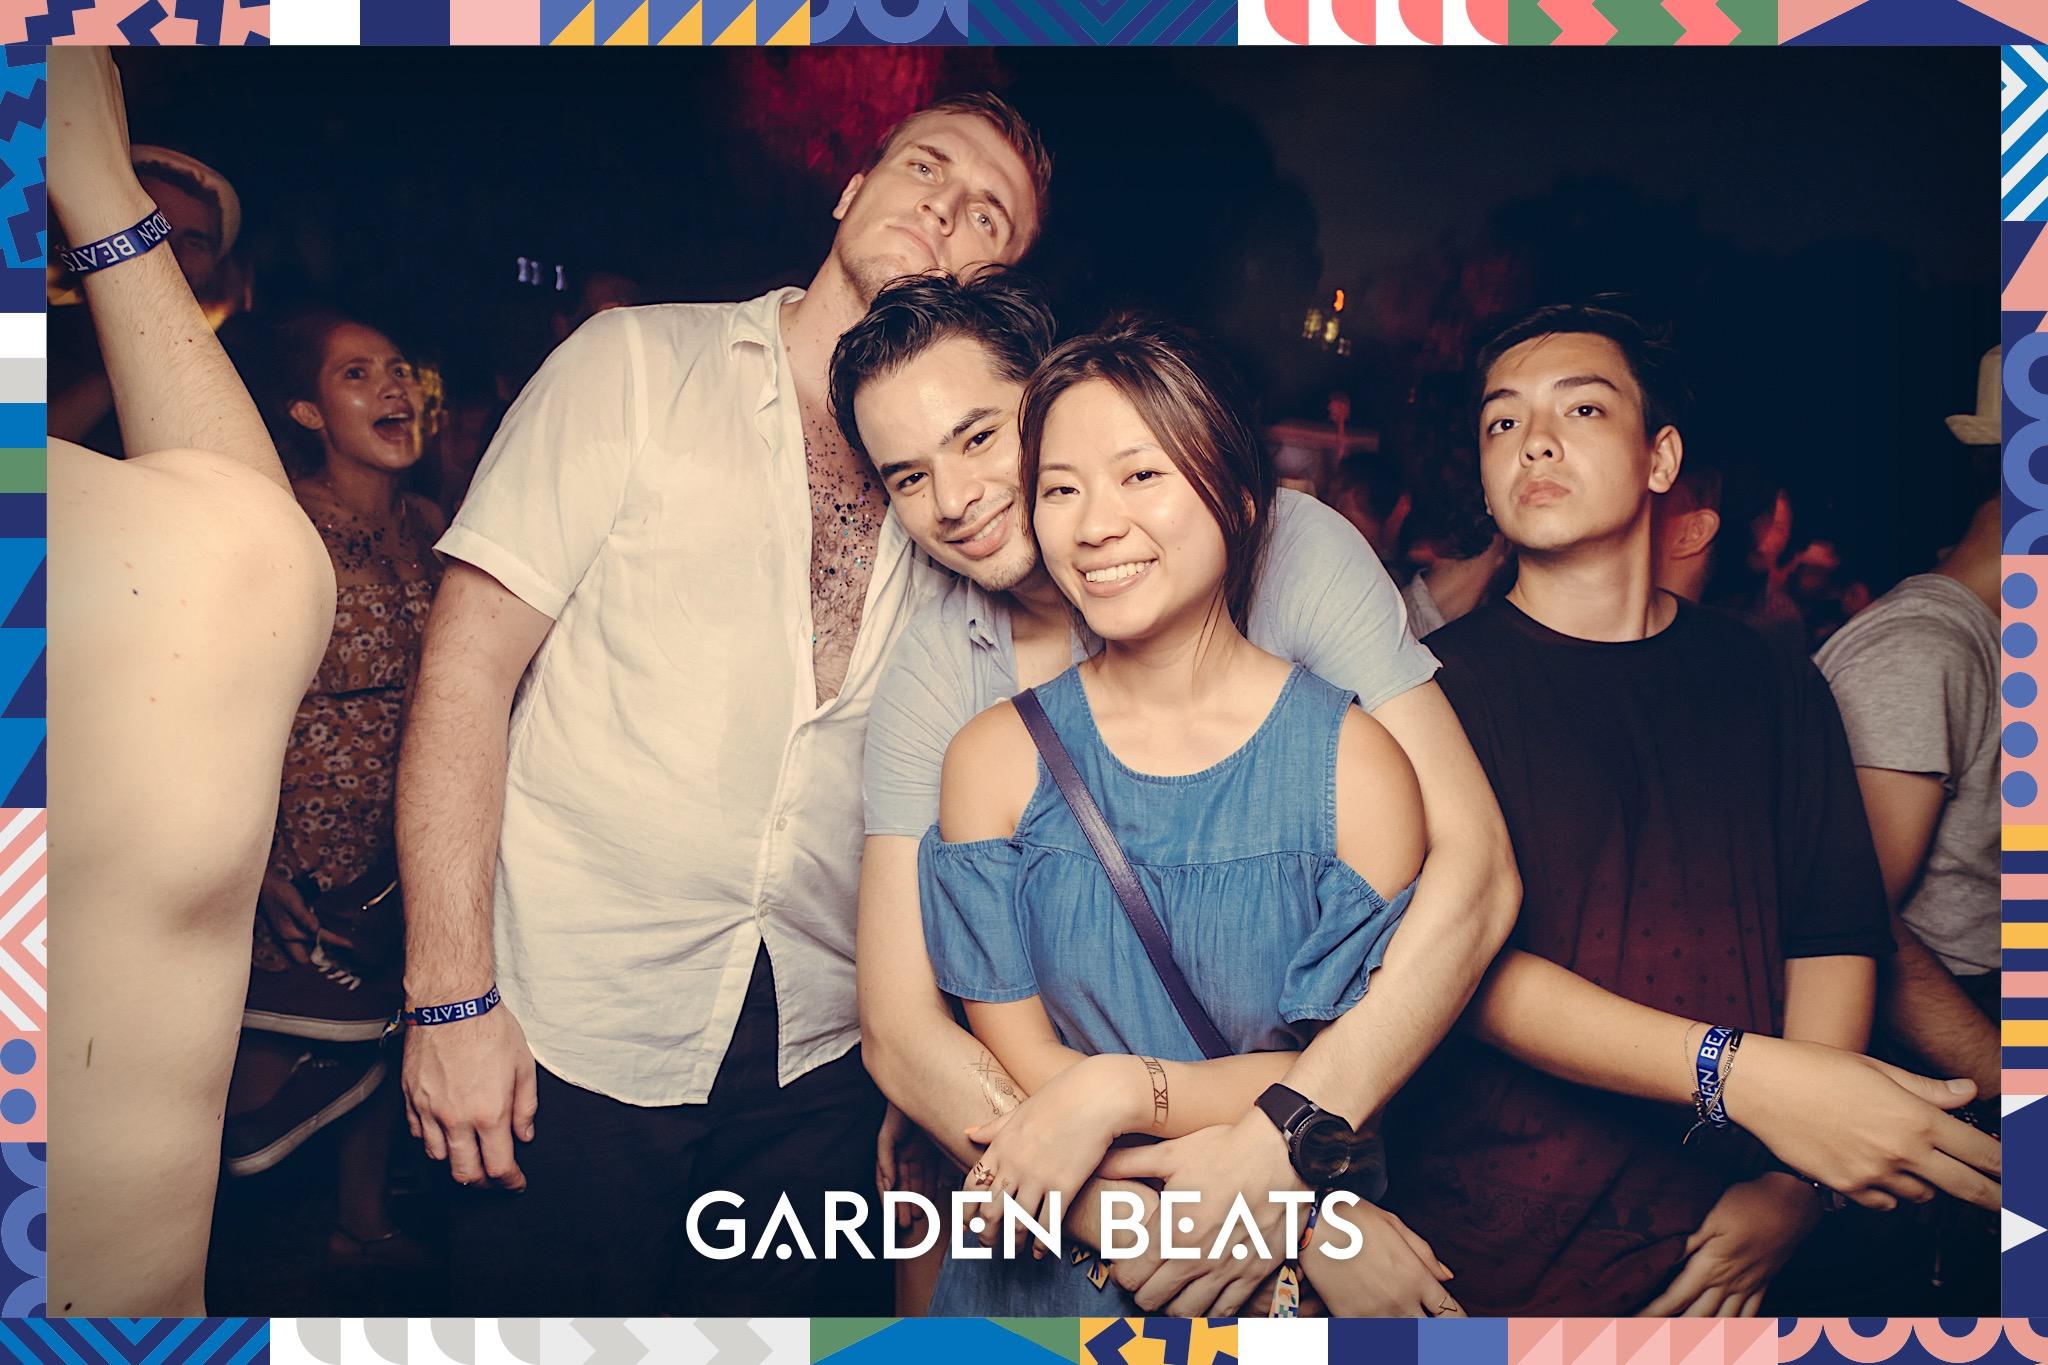 18032017_GardenBeats_Colossal882_WatermarkedGB.jpg